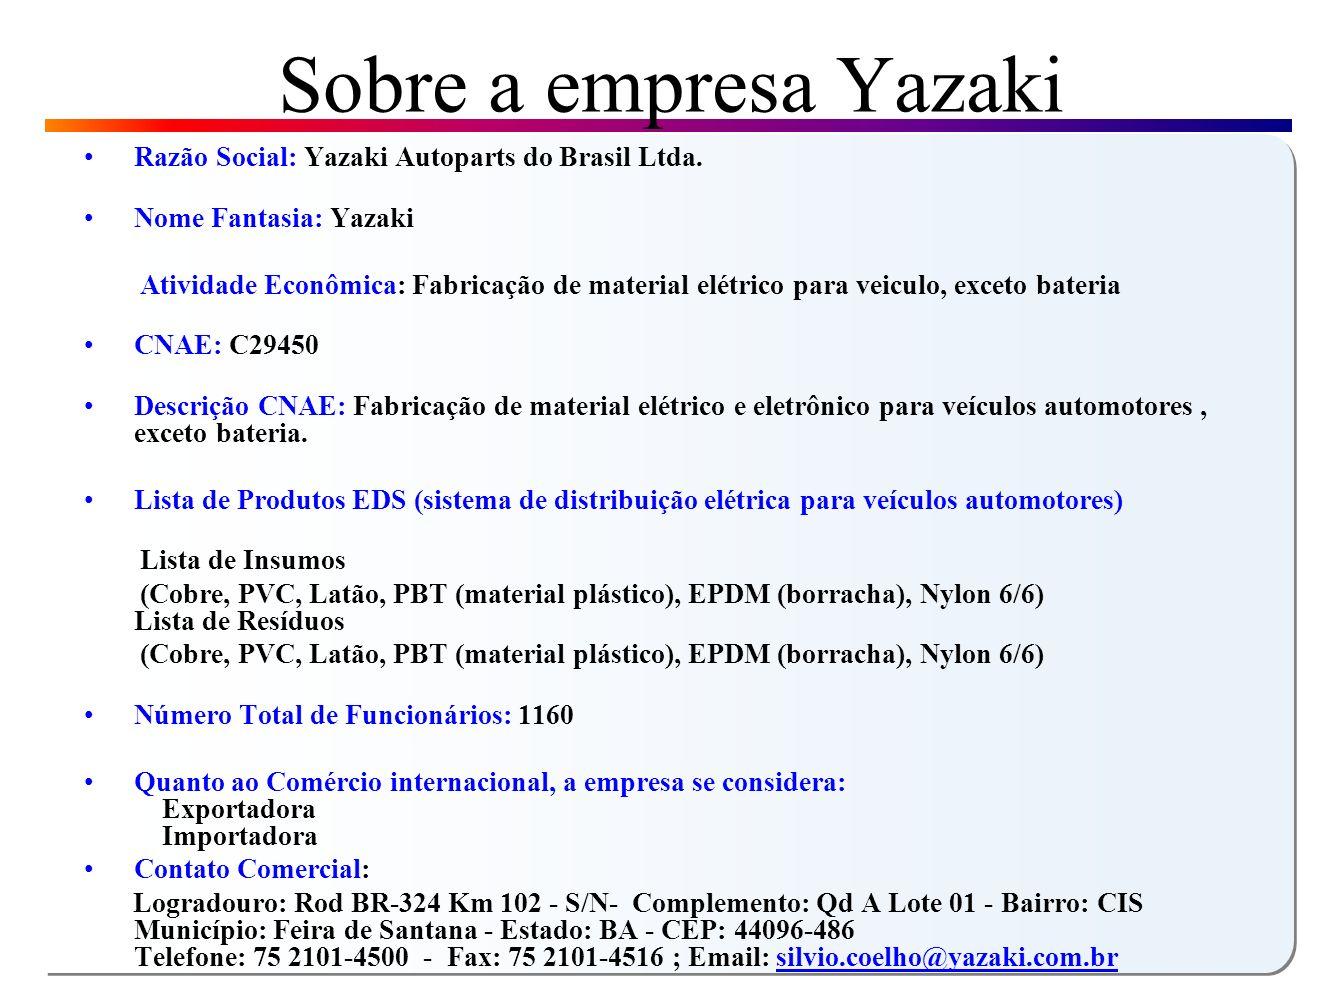 Sobre a empresa Yazaki Razão Social: Yazaki Autoparts do Brasil Ltda.